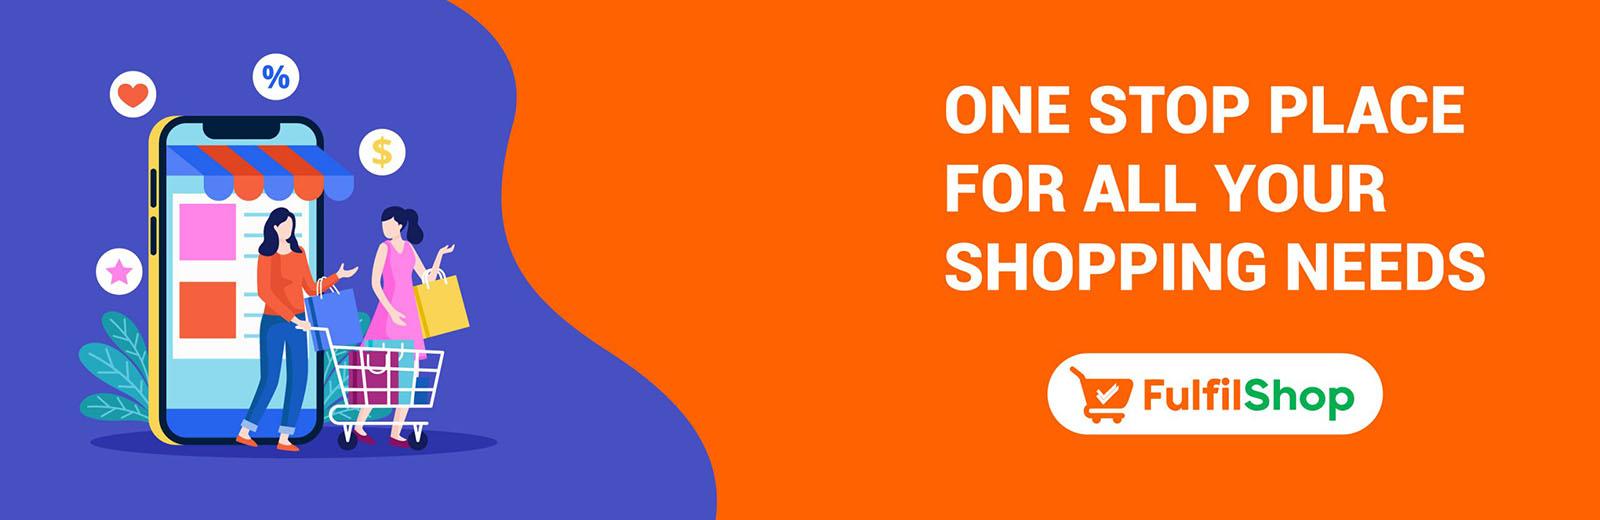 fulfilshop-one-stop-solution1